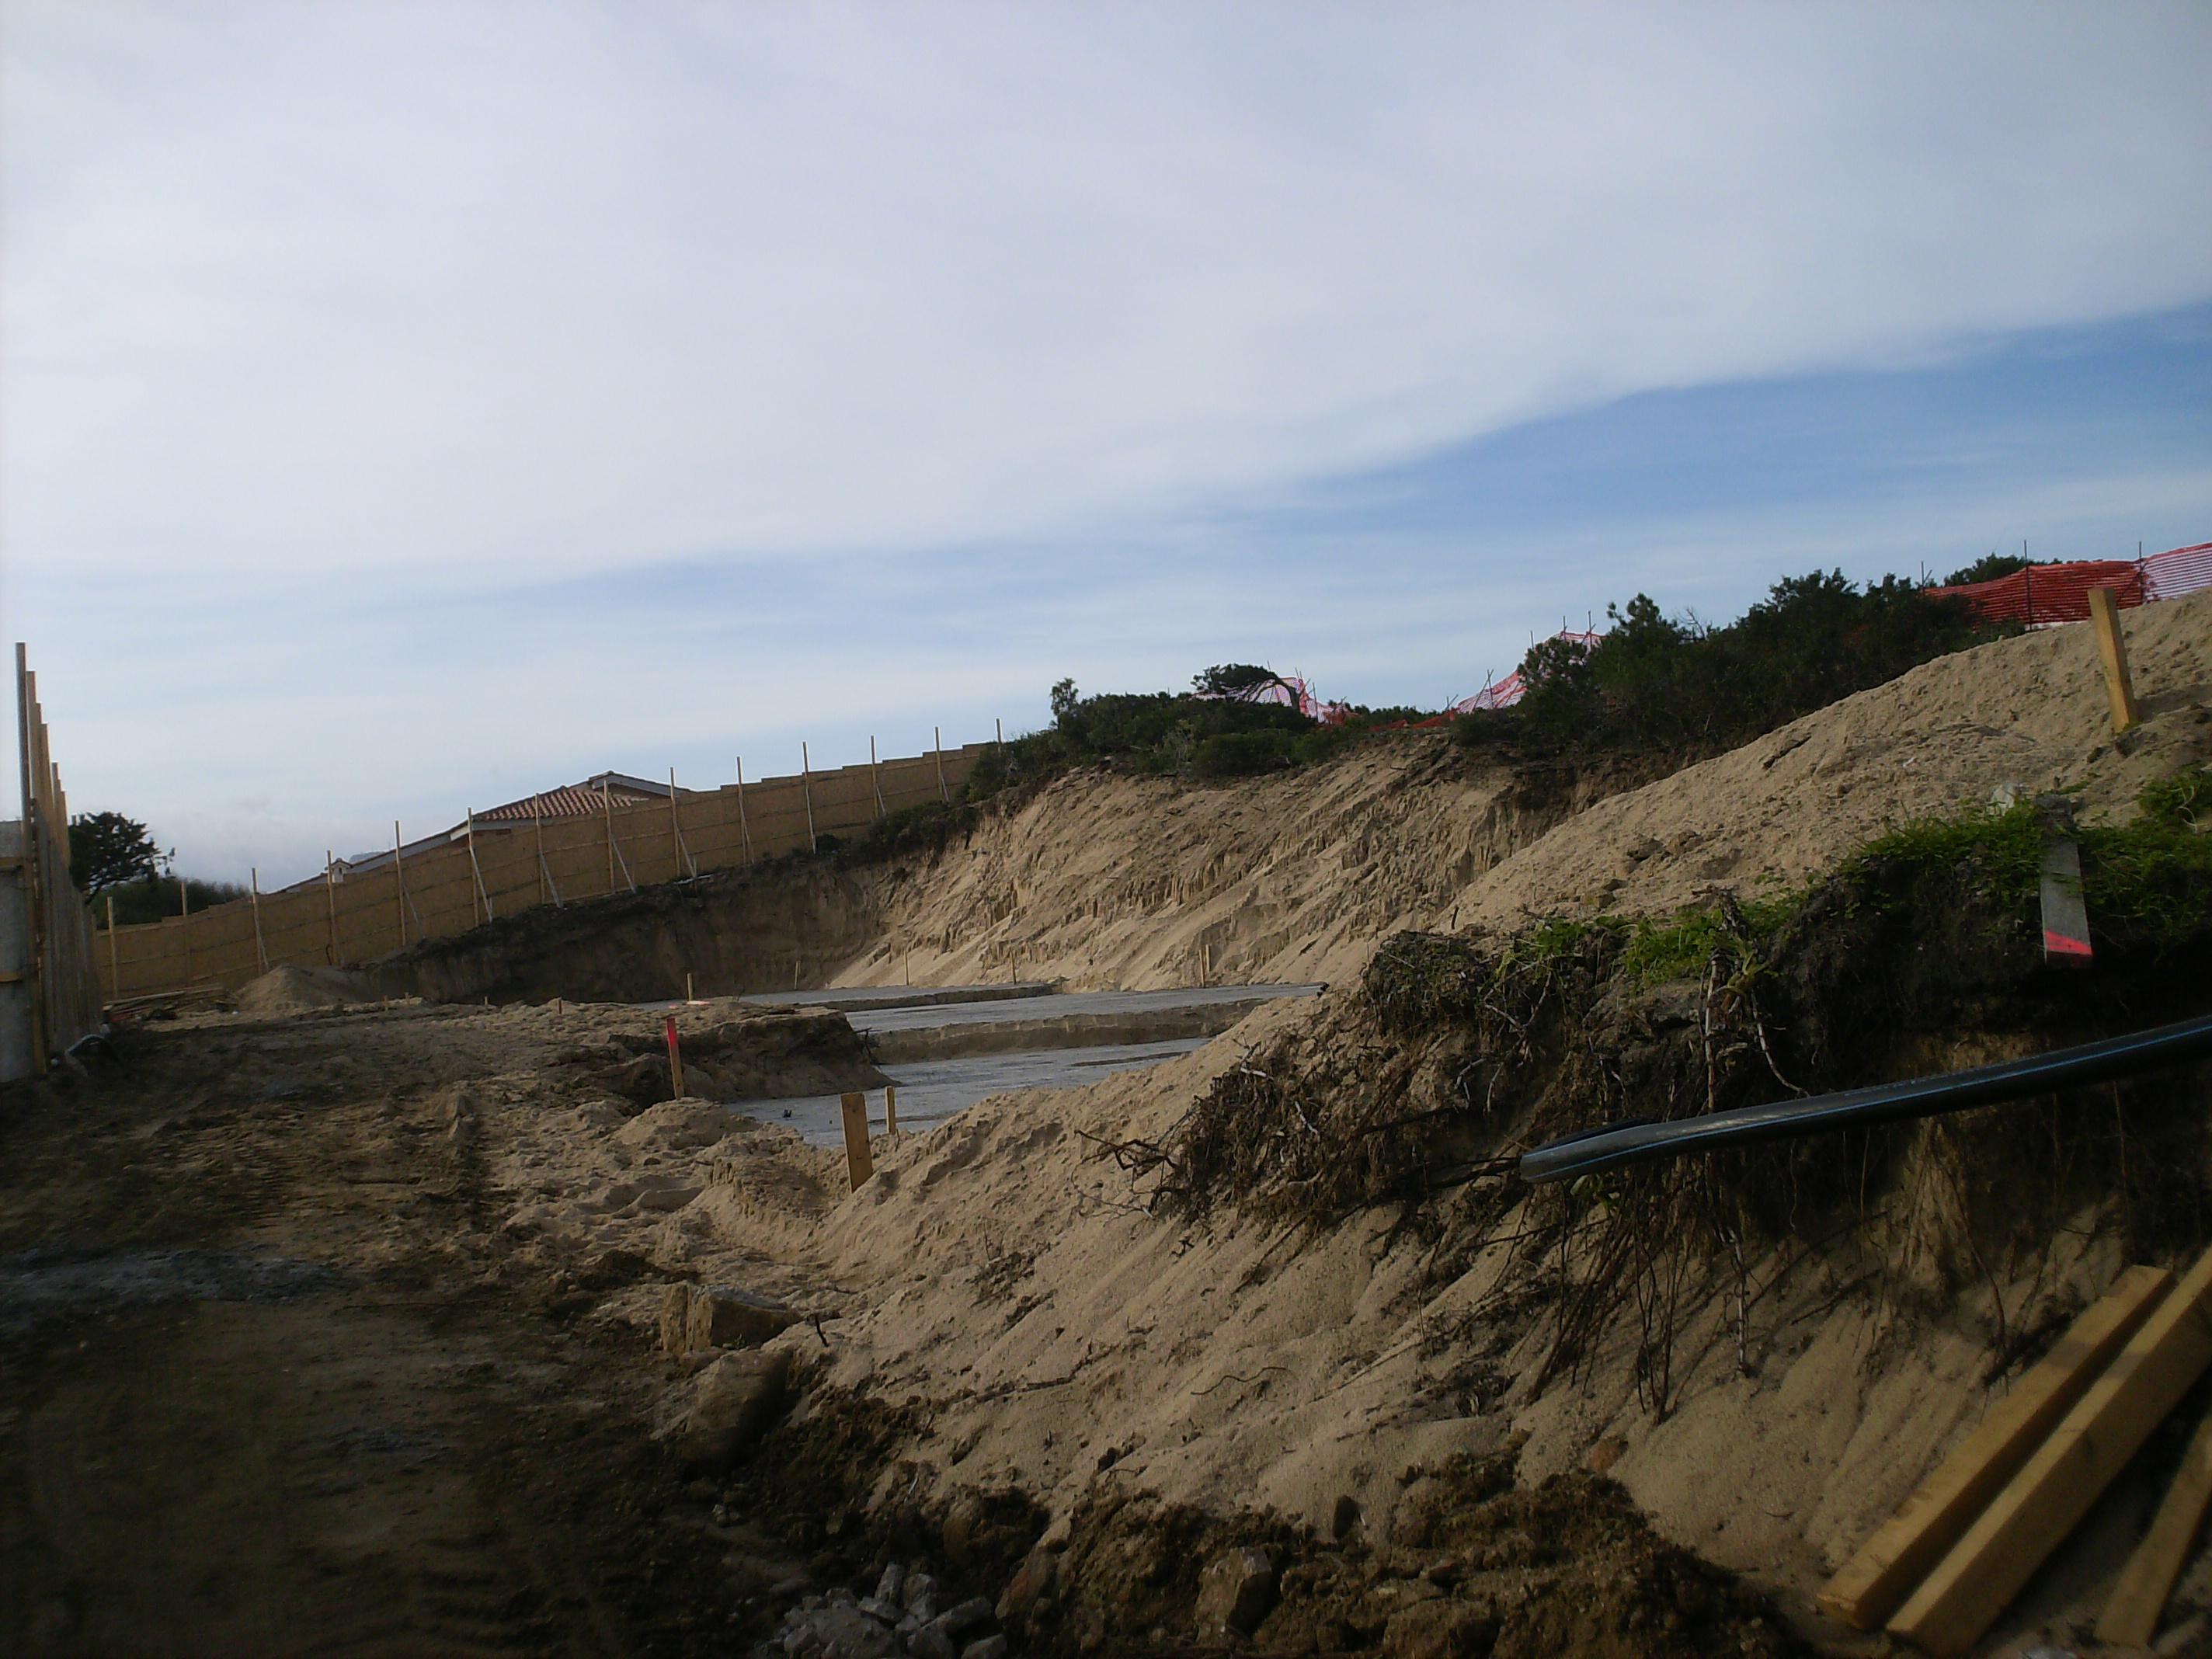 Badesi, cantiere edilizio sulle dune